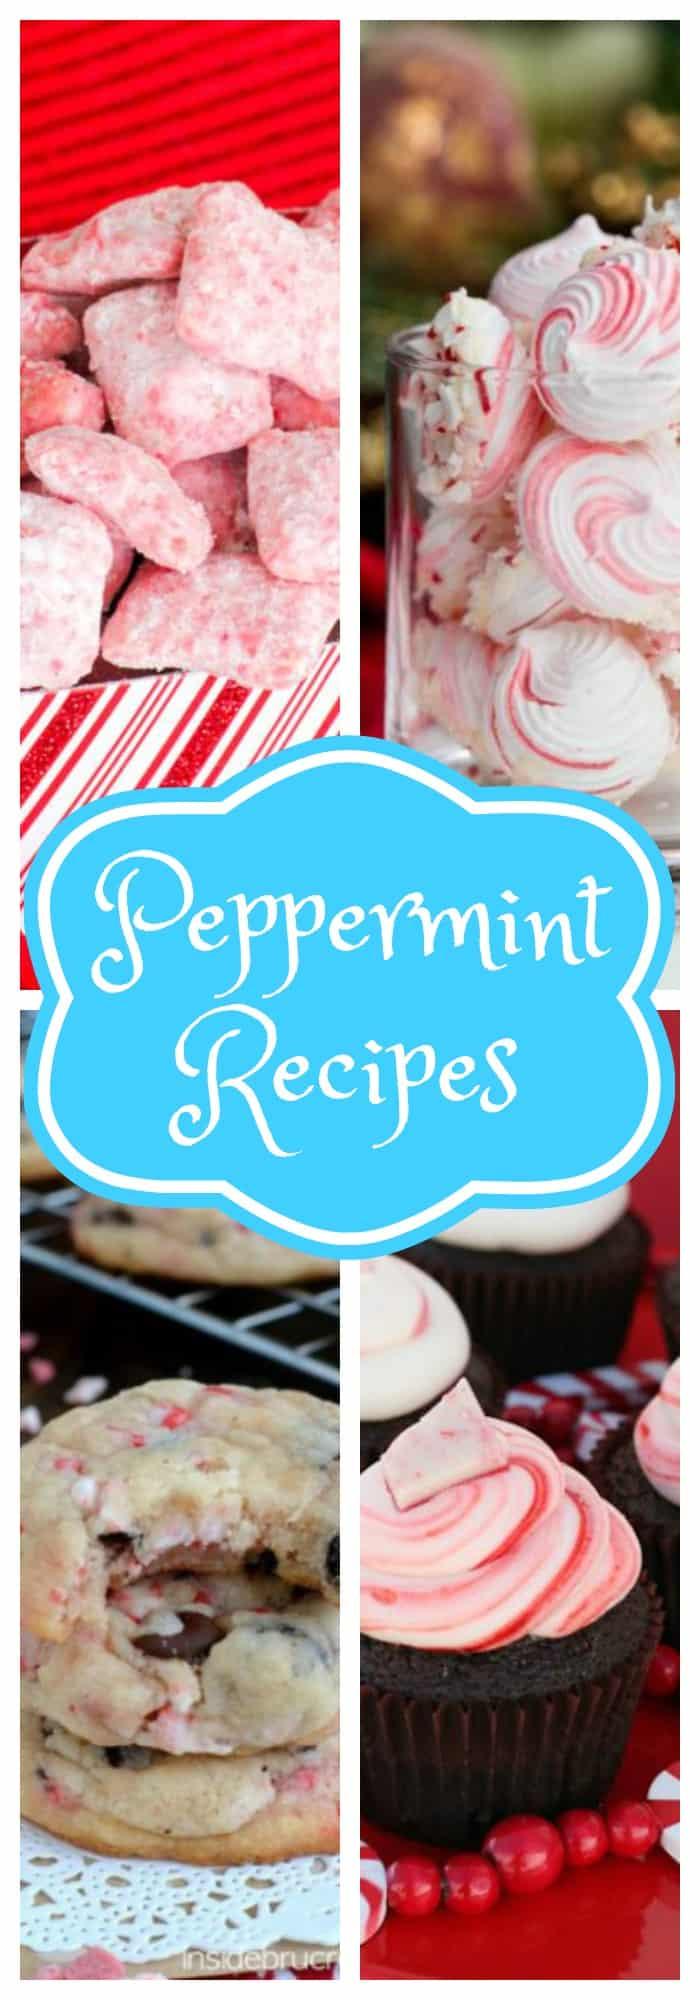 peppermint recipes